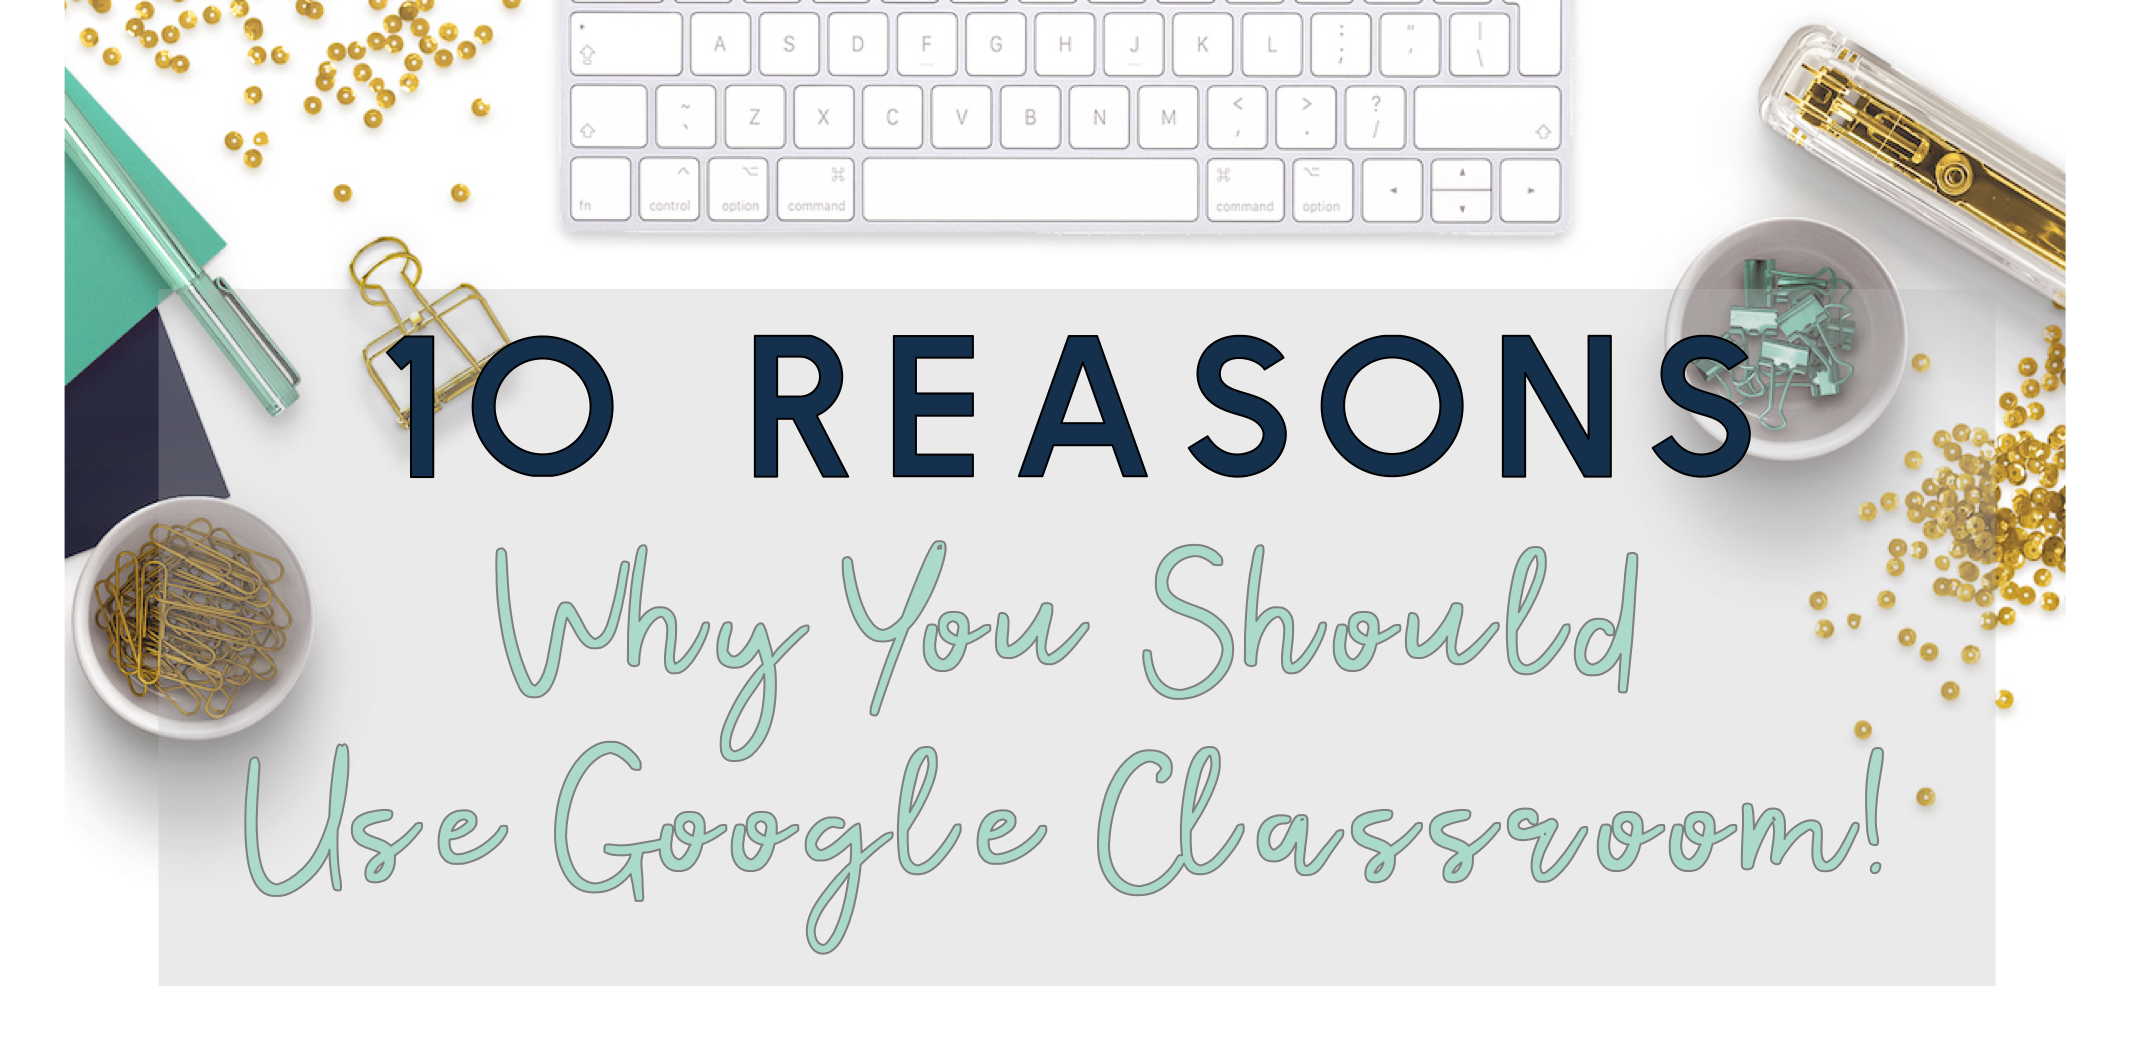 why-use-google-classroom-1